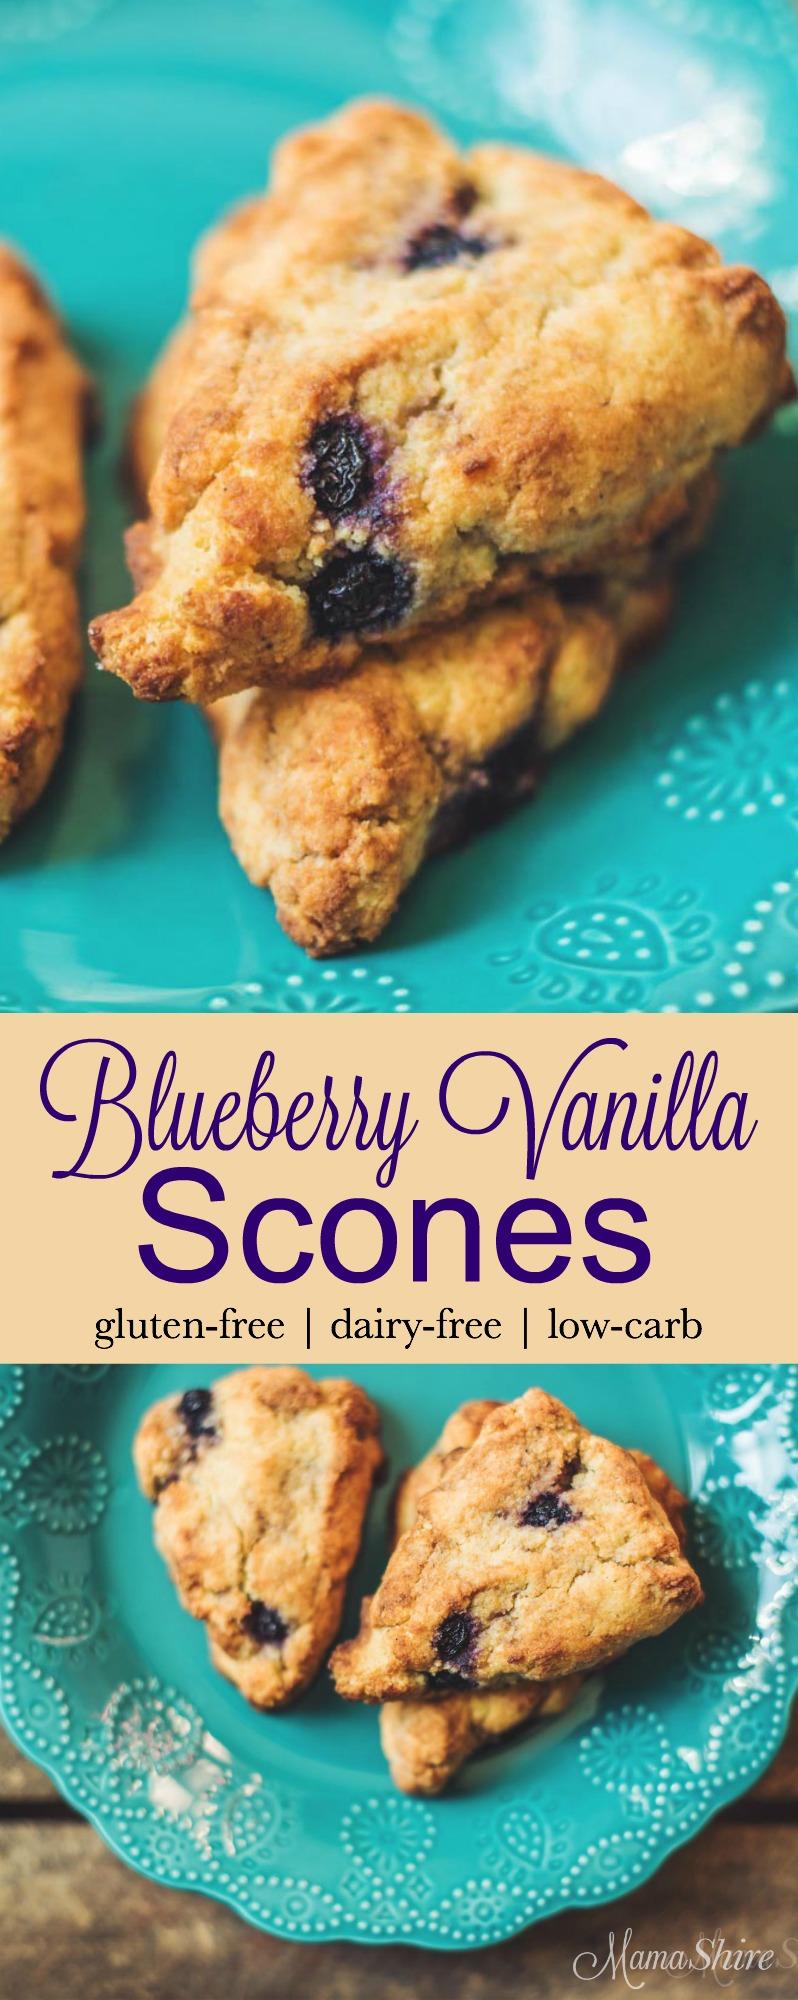 Blueberry Vanilla Scones - Gluten-free, Dairy-free, Sugar-free, Low-Carb, THM-S